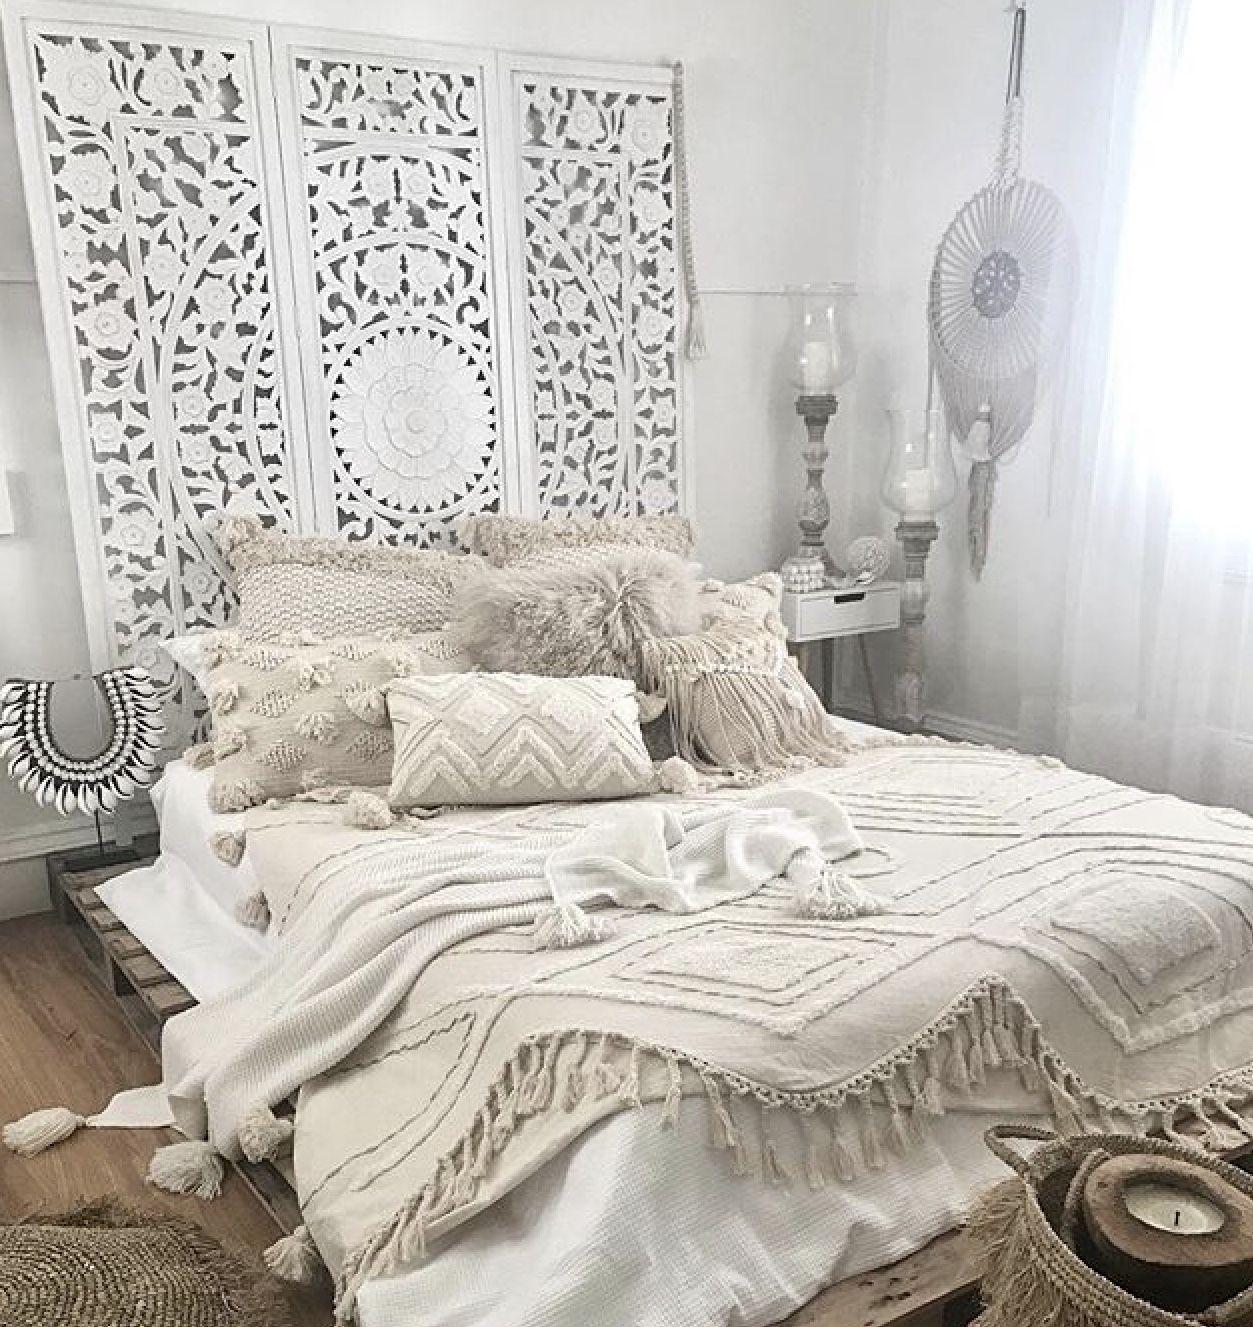 Bedroom inspo home decor bedrooms sweet bohemian also and bedding design ideas boho rh pinterest